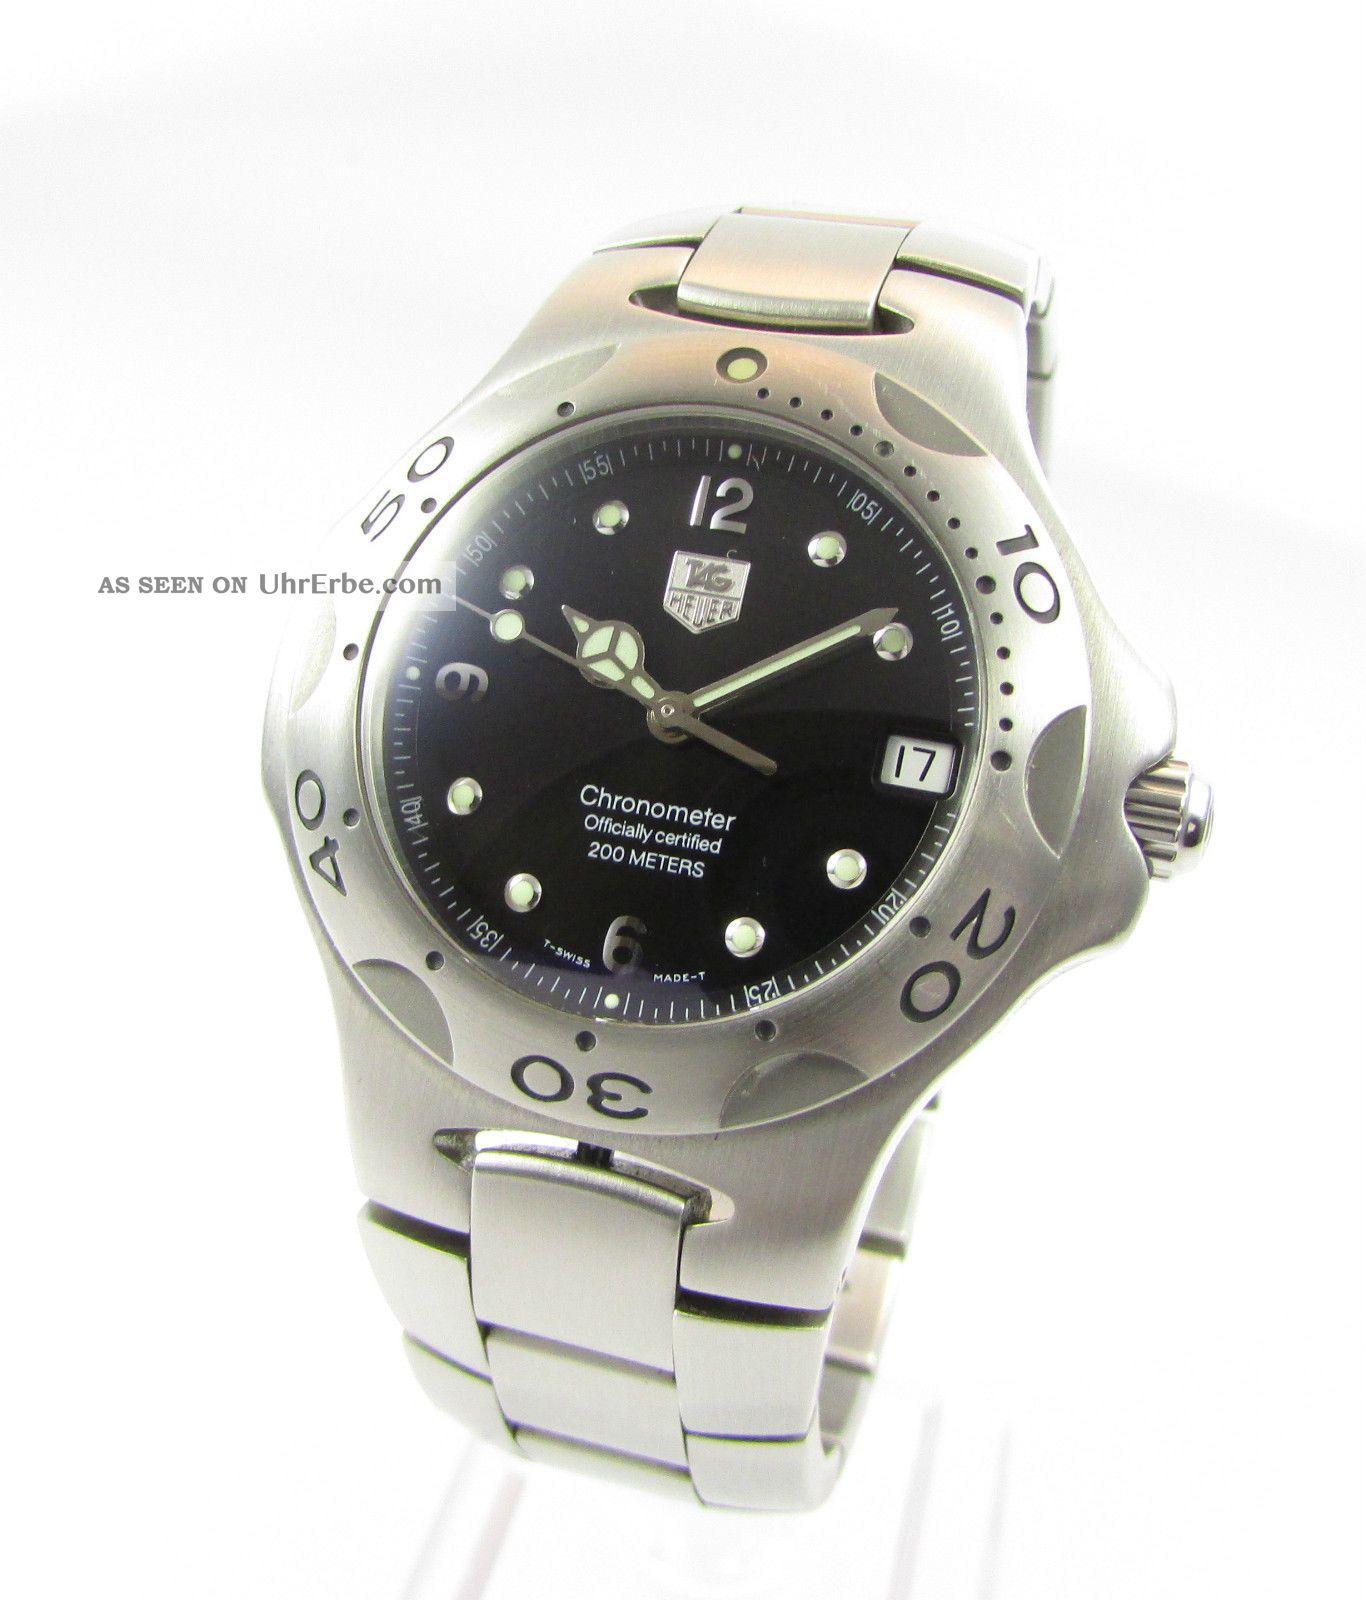 Tag Heuer Kirium Professional Automatik - Chronometer Zertifiziert - Topzustand Armbanduhren Bild